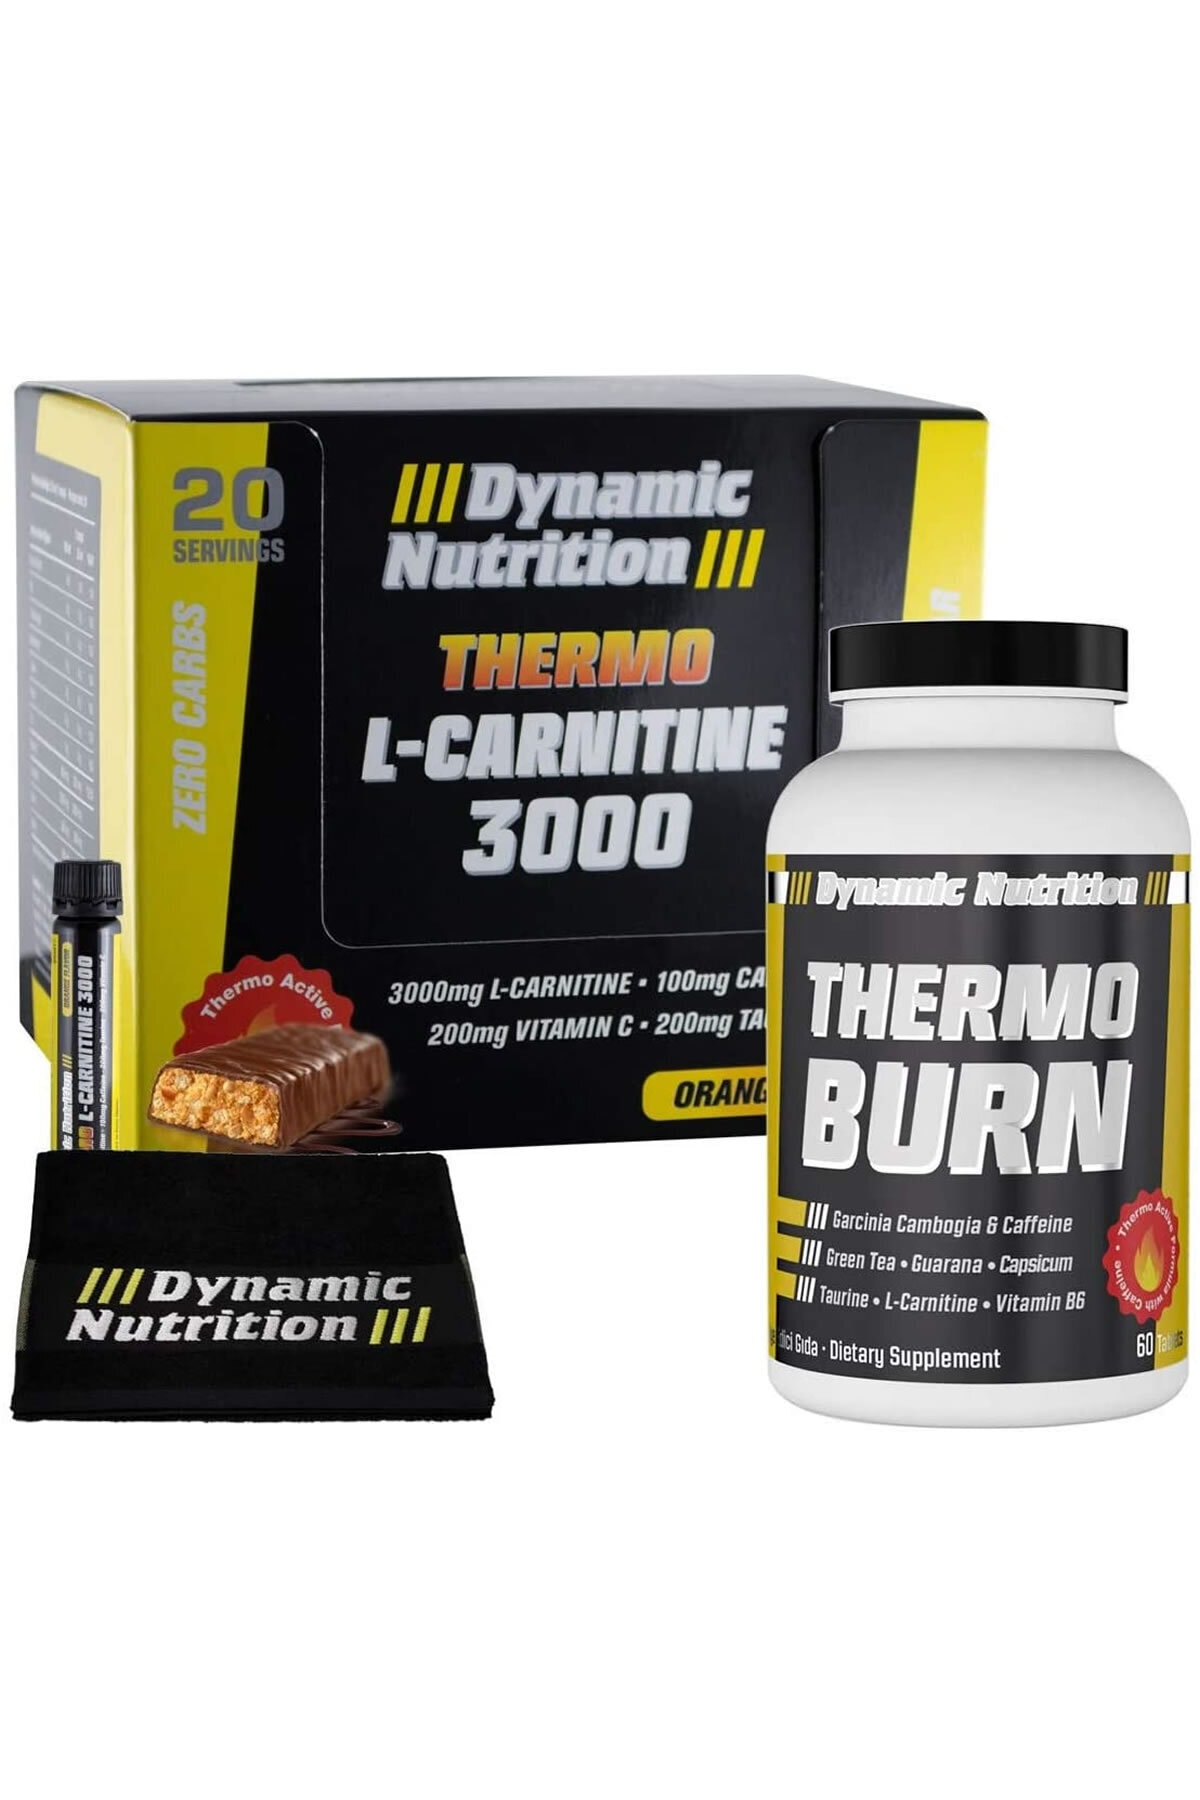 Dynamic Nutrition Dynamic Thermo L-Carnitine 3000 mg 20 Ampul + Thermo Burn 60 Tablet + 3 HEDİYE 1